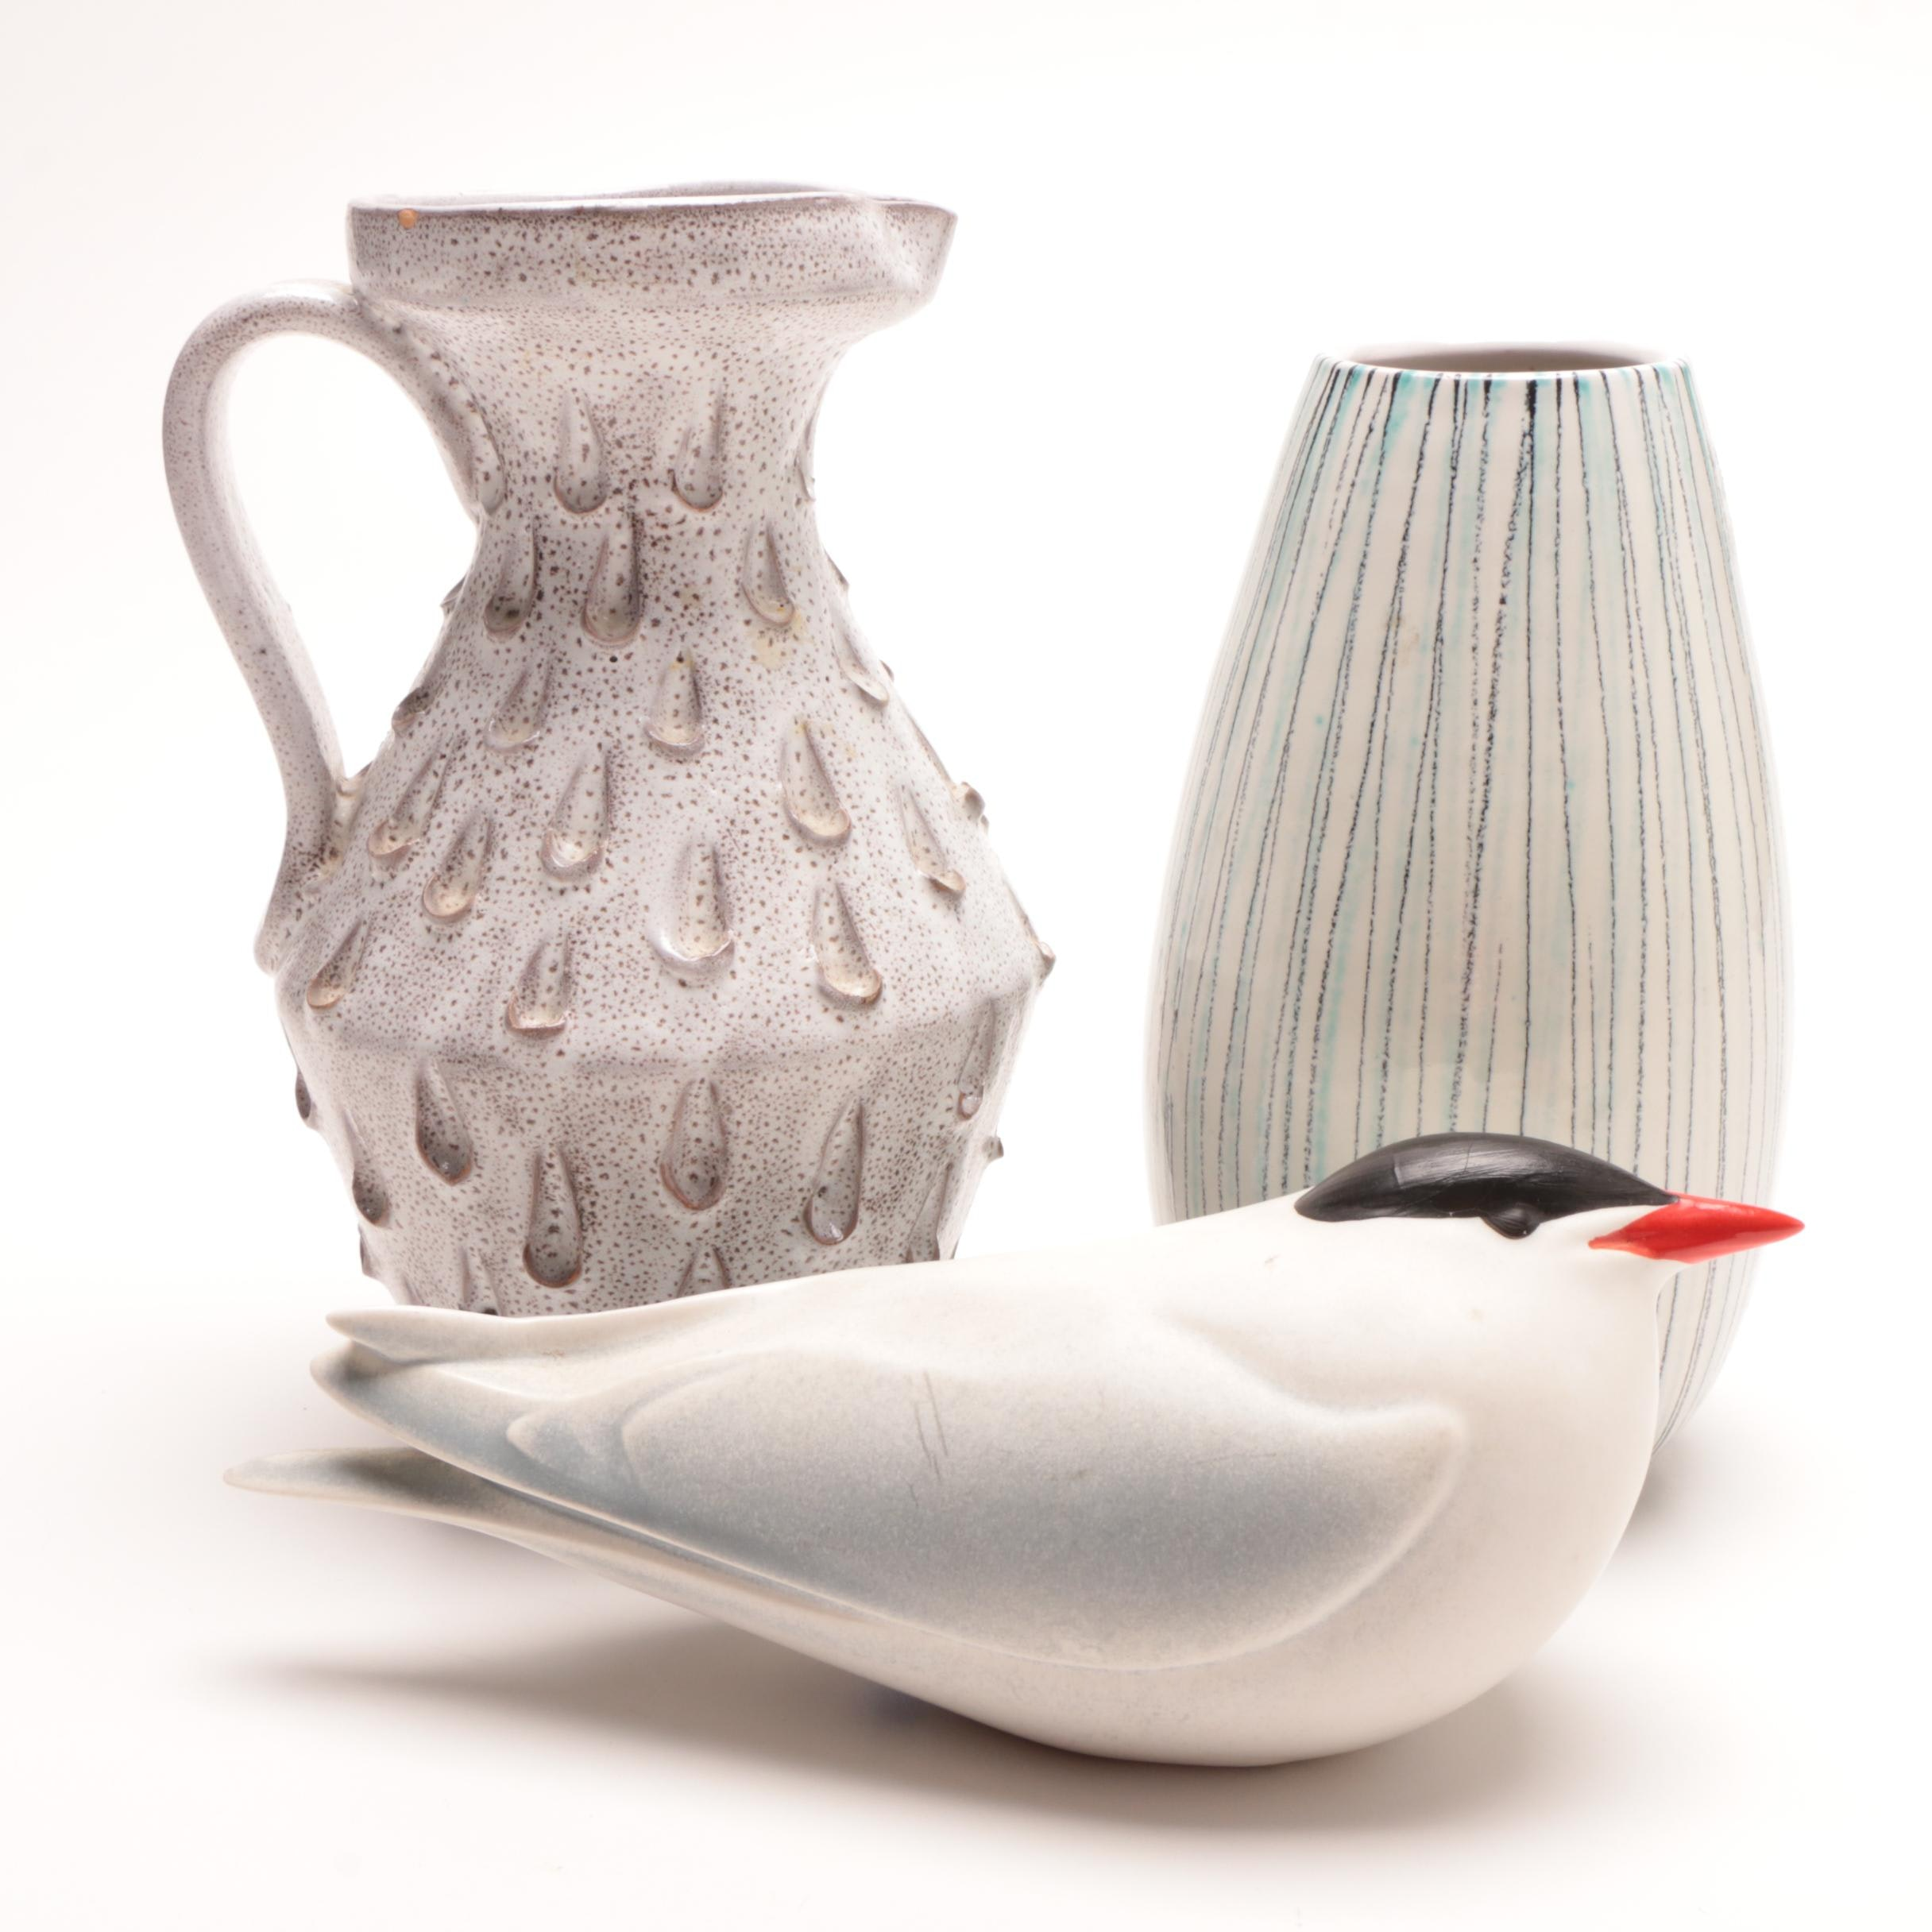 Paul Hoff Gustavsberg Bird Figure with Mid-Century Italian Vases